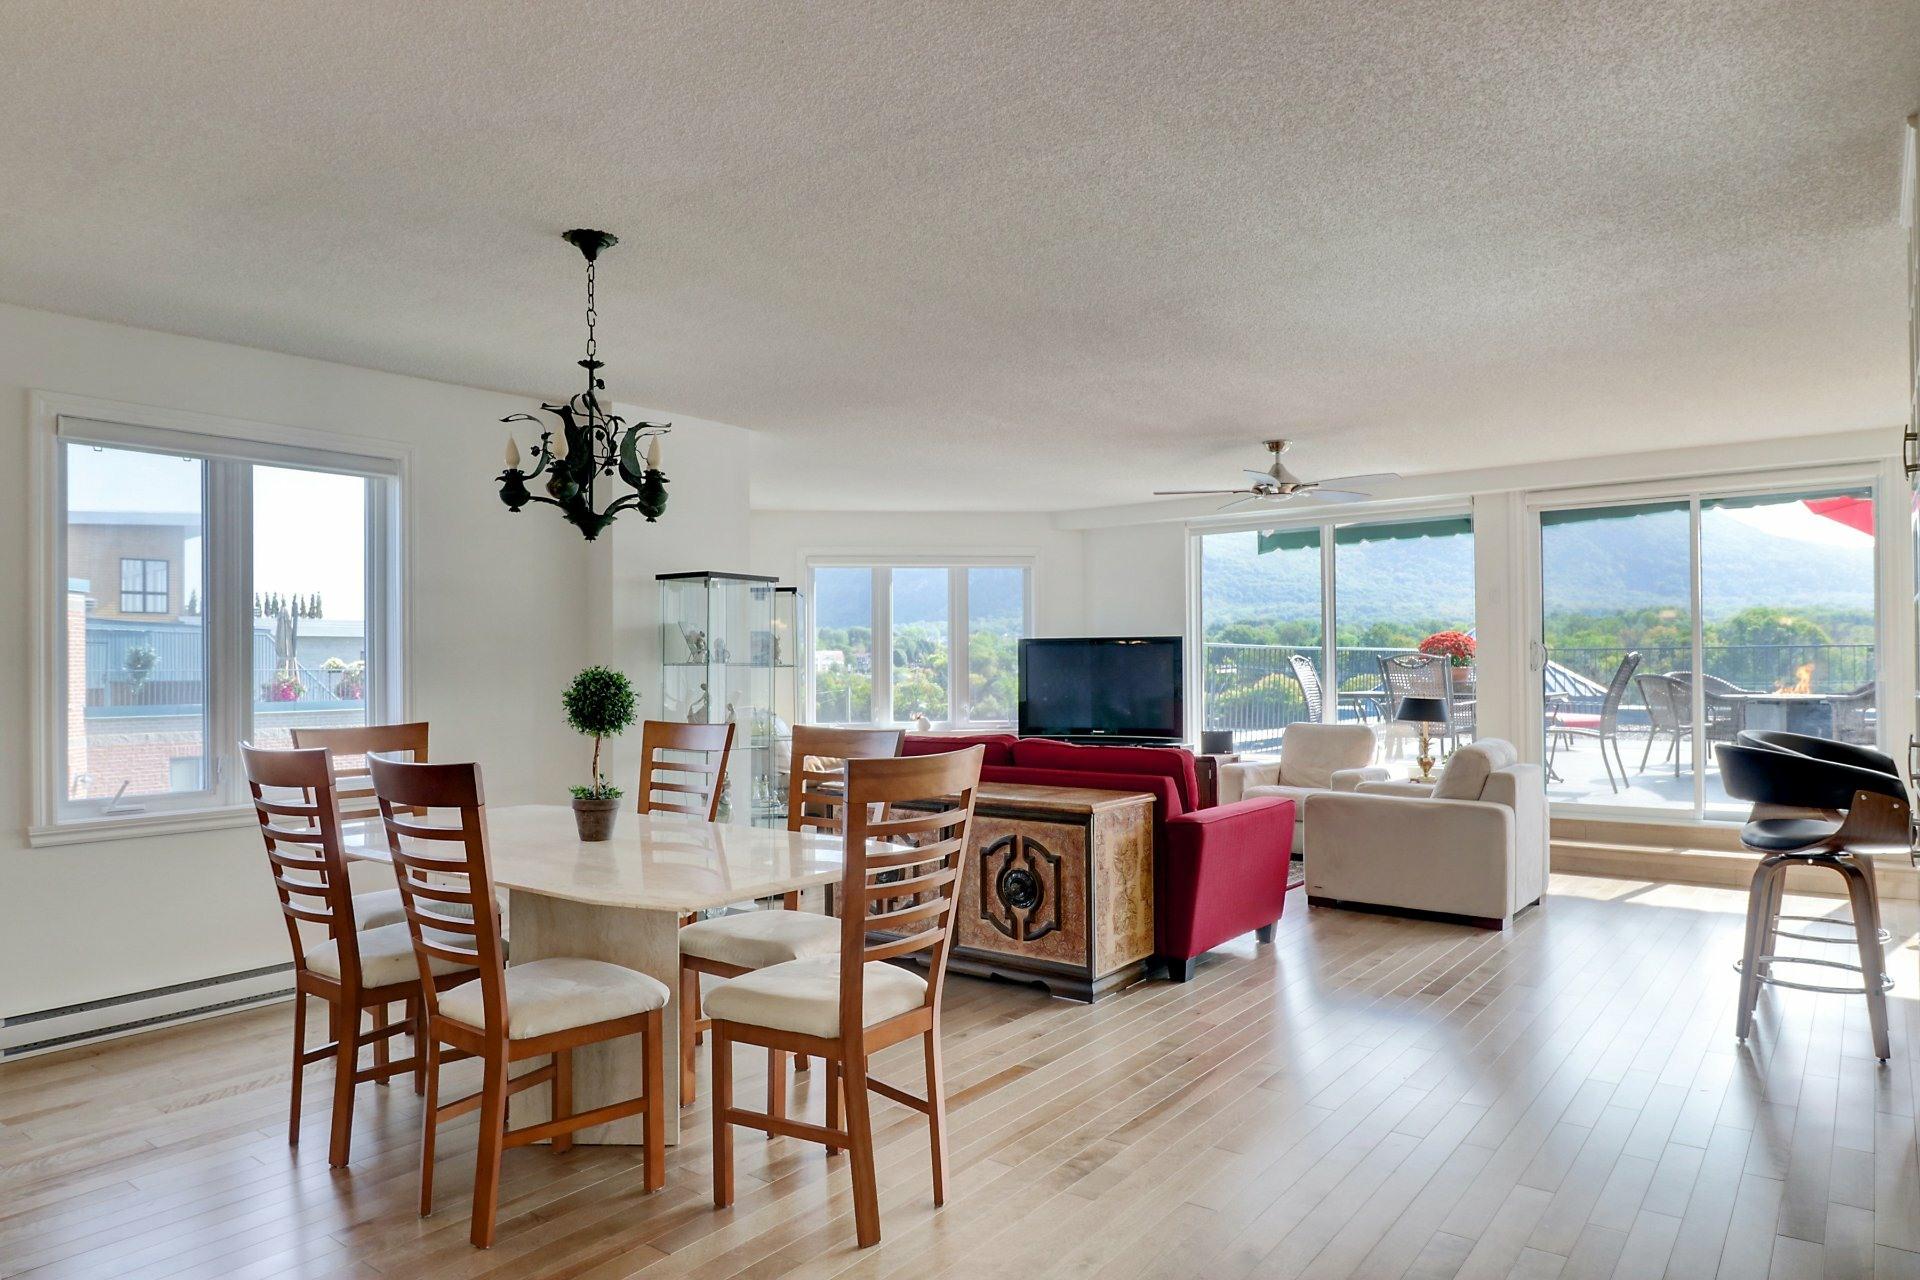 image 2 - Apartment For sale Beloeil - 9 rooms